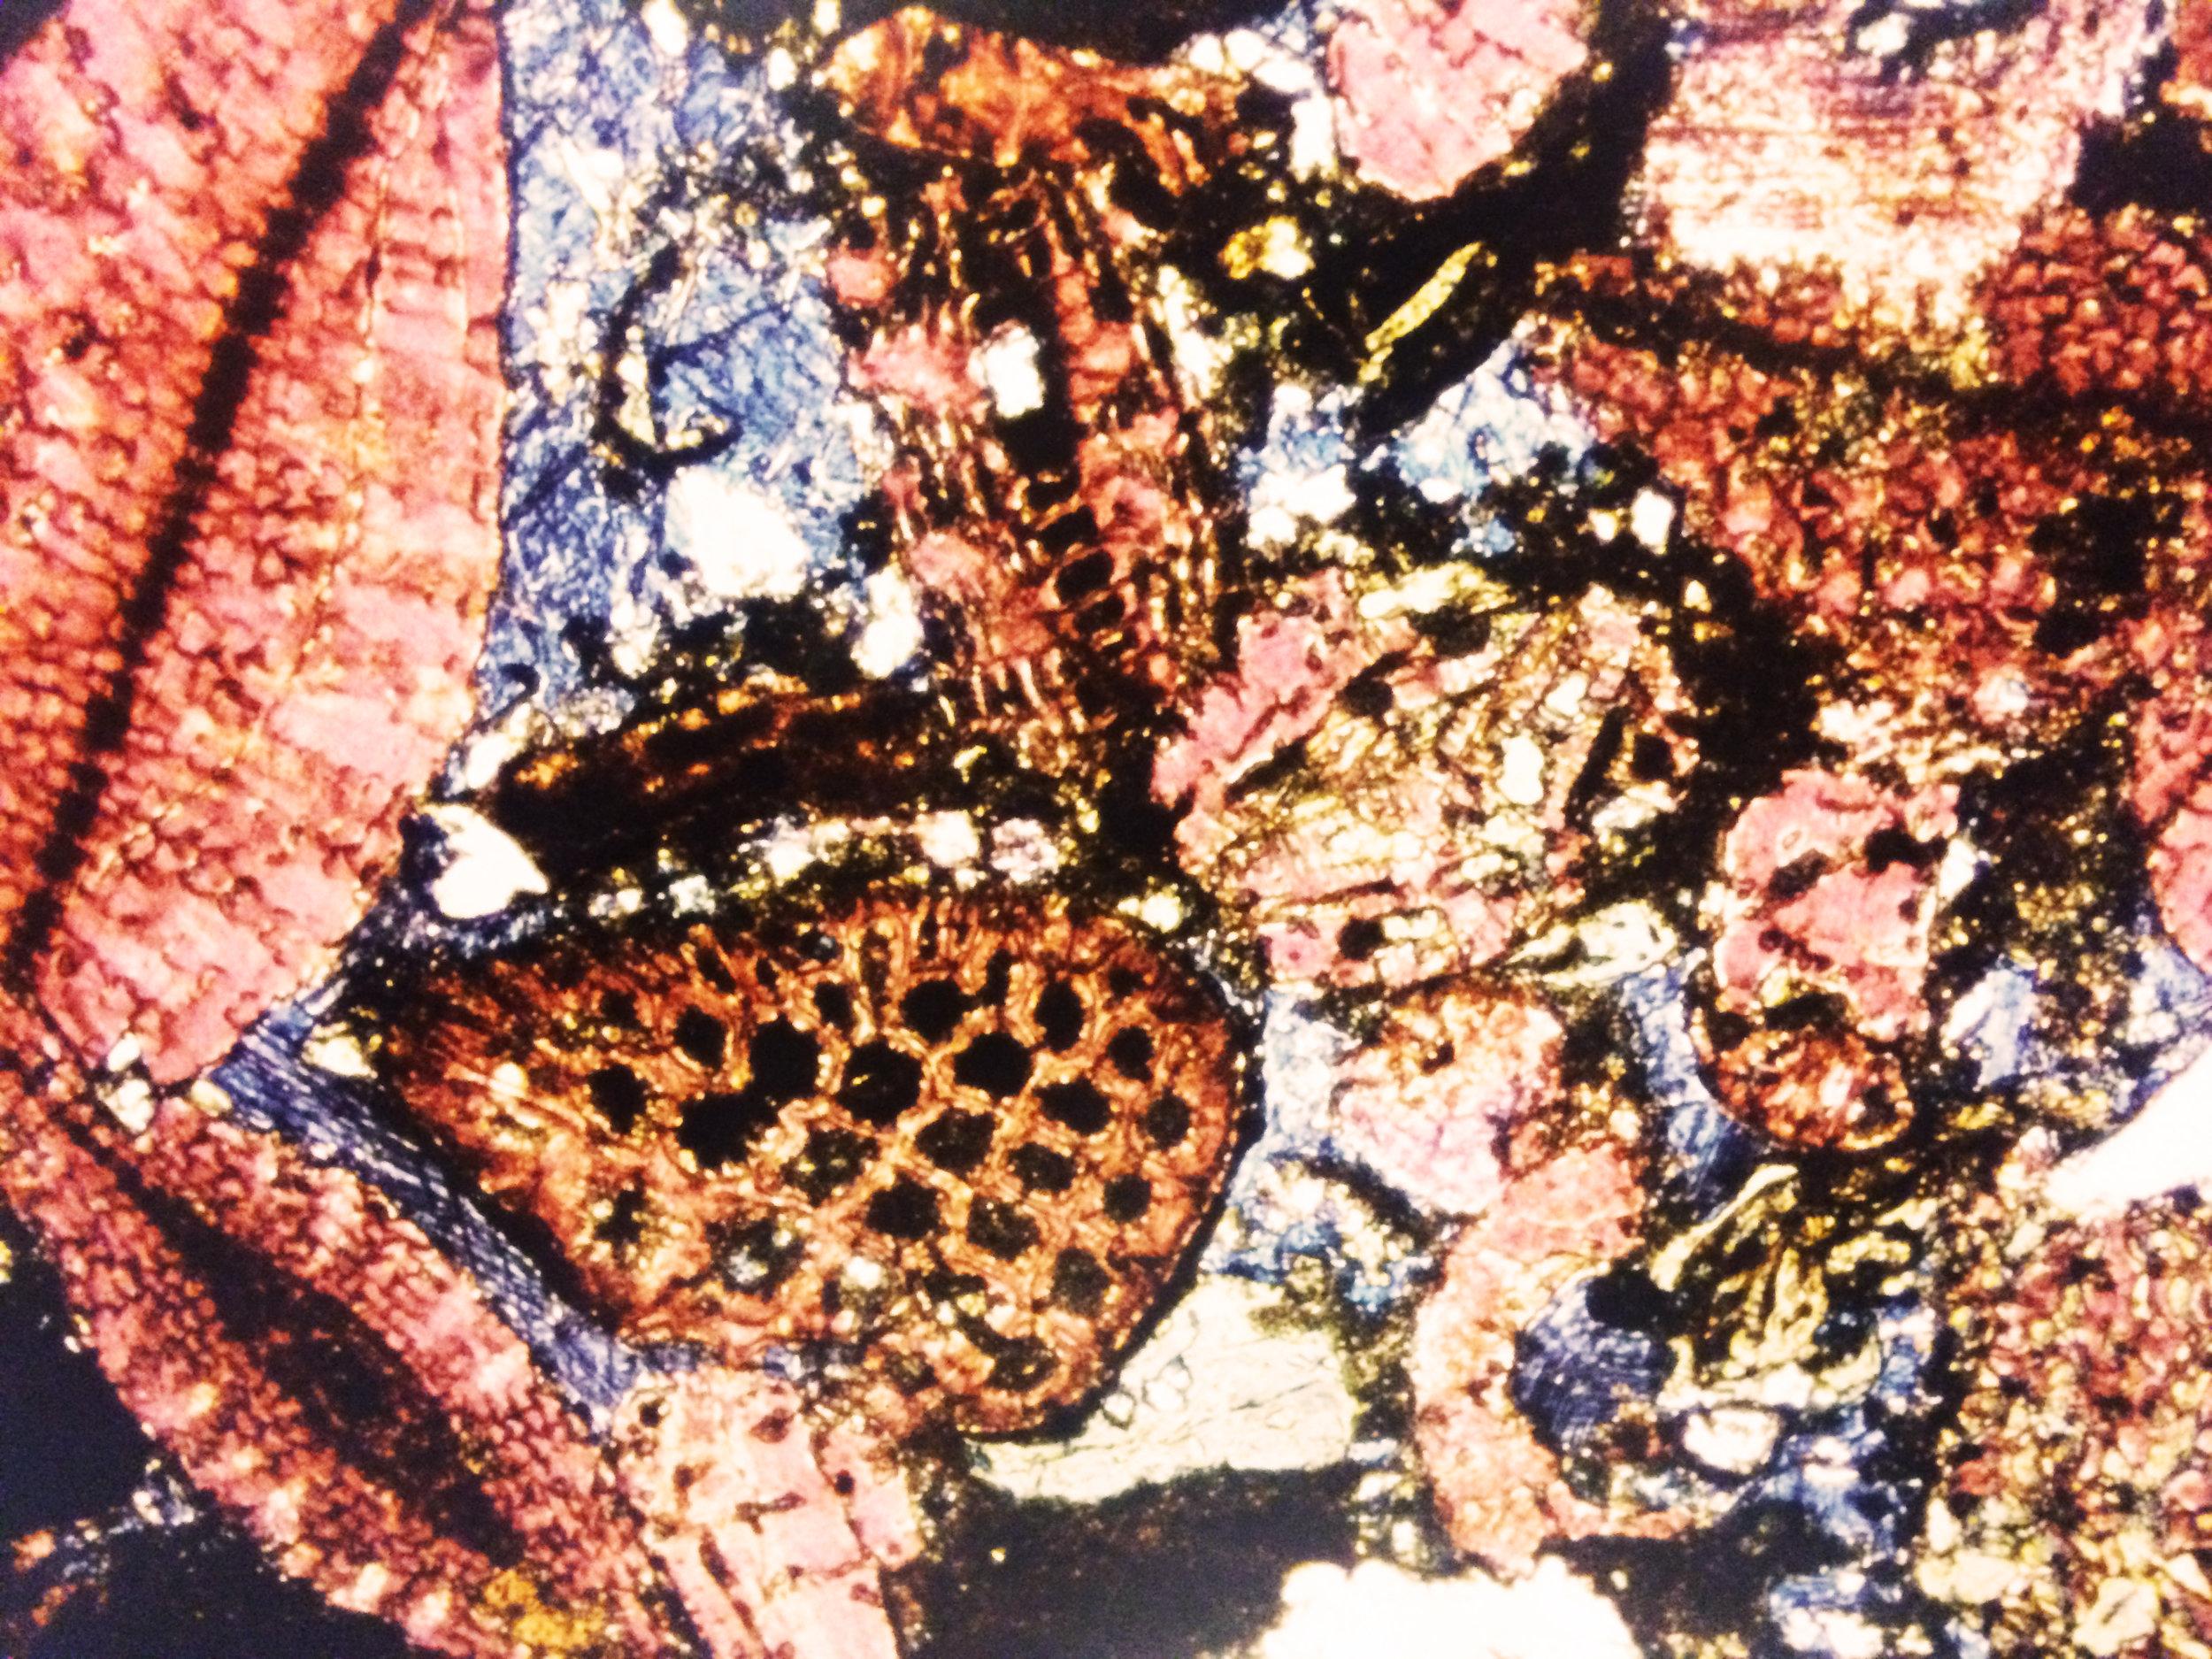 microscope Image Oil